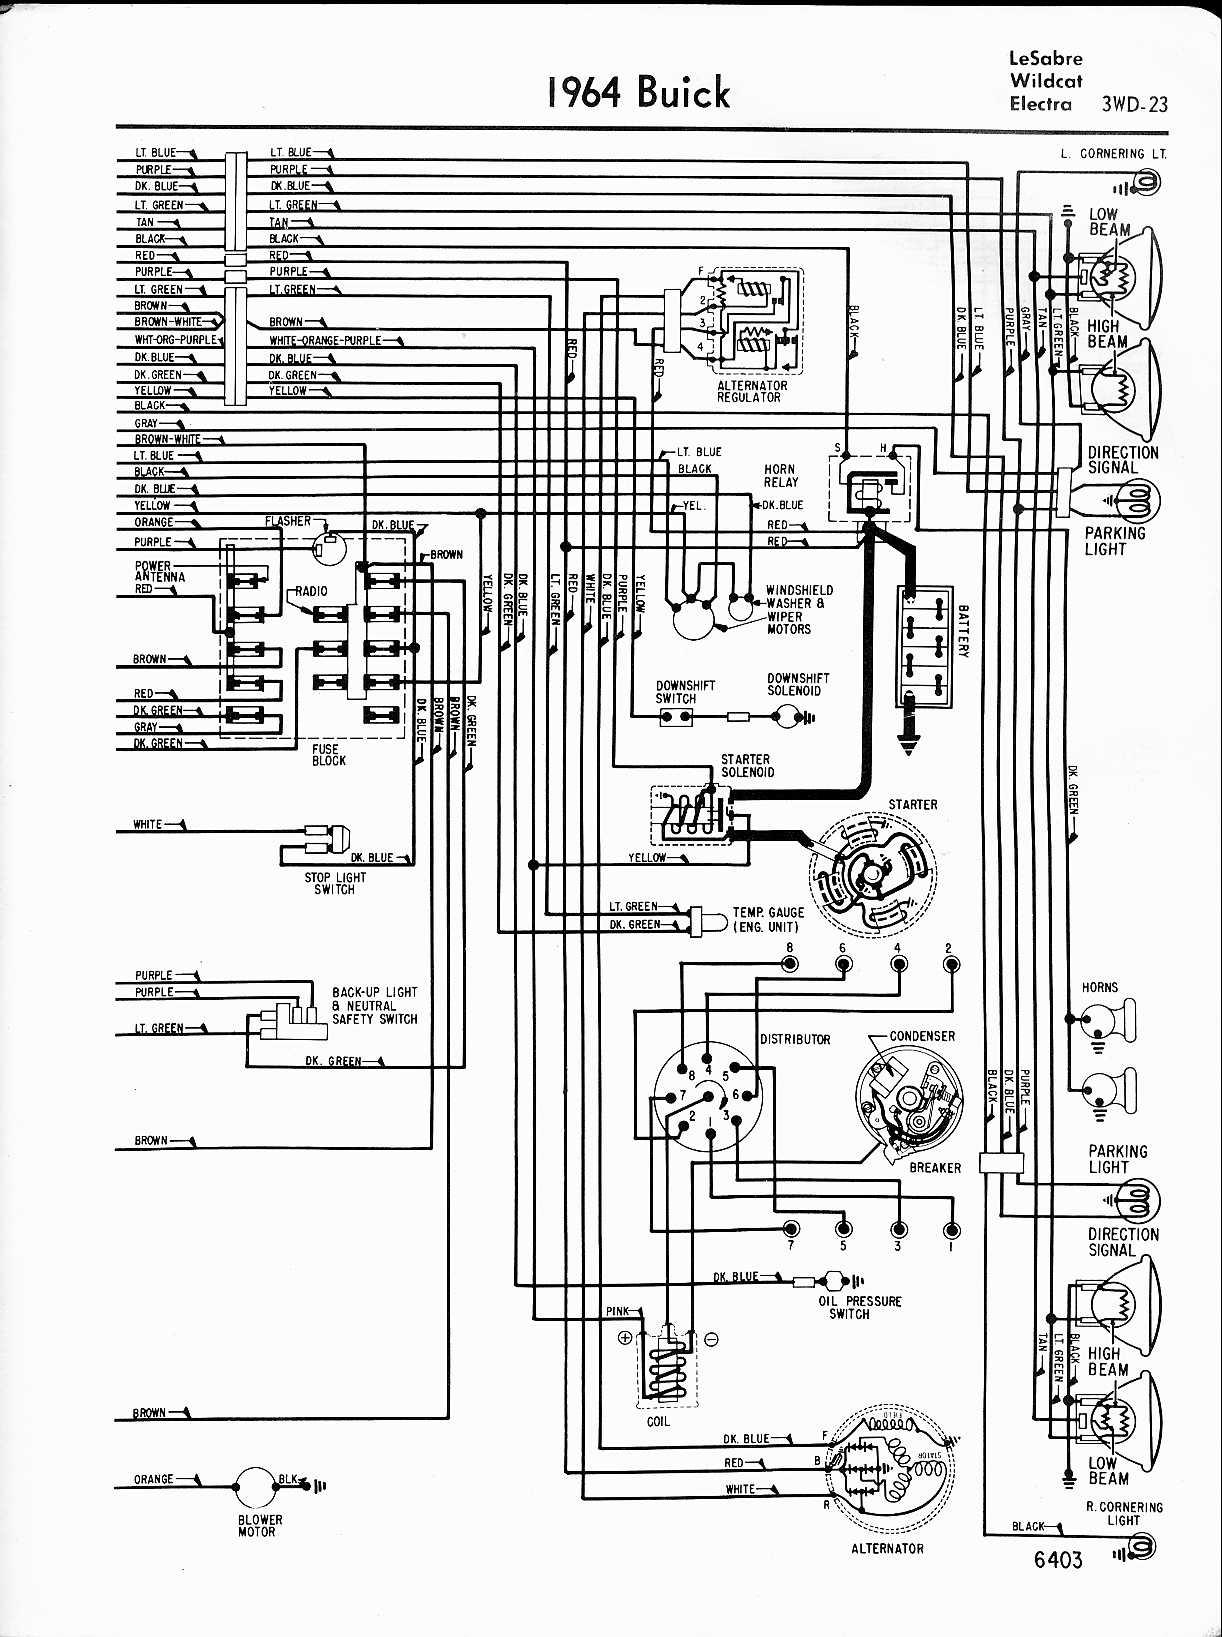 97 Kawasaki Prairie 400 Wiring Diagram Diagram – Kawasaki Prairie 300 Wiring Harness